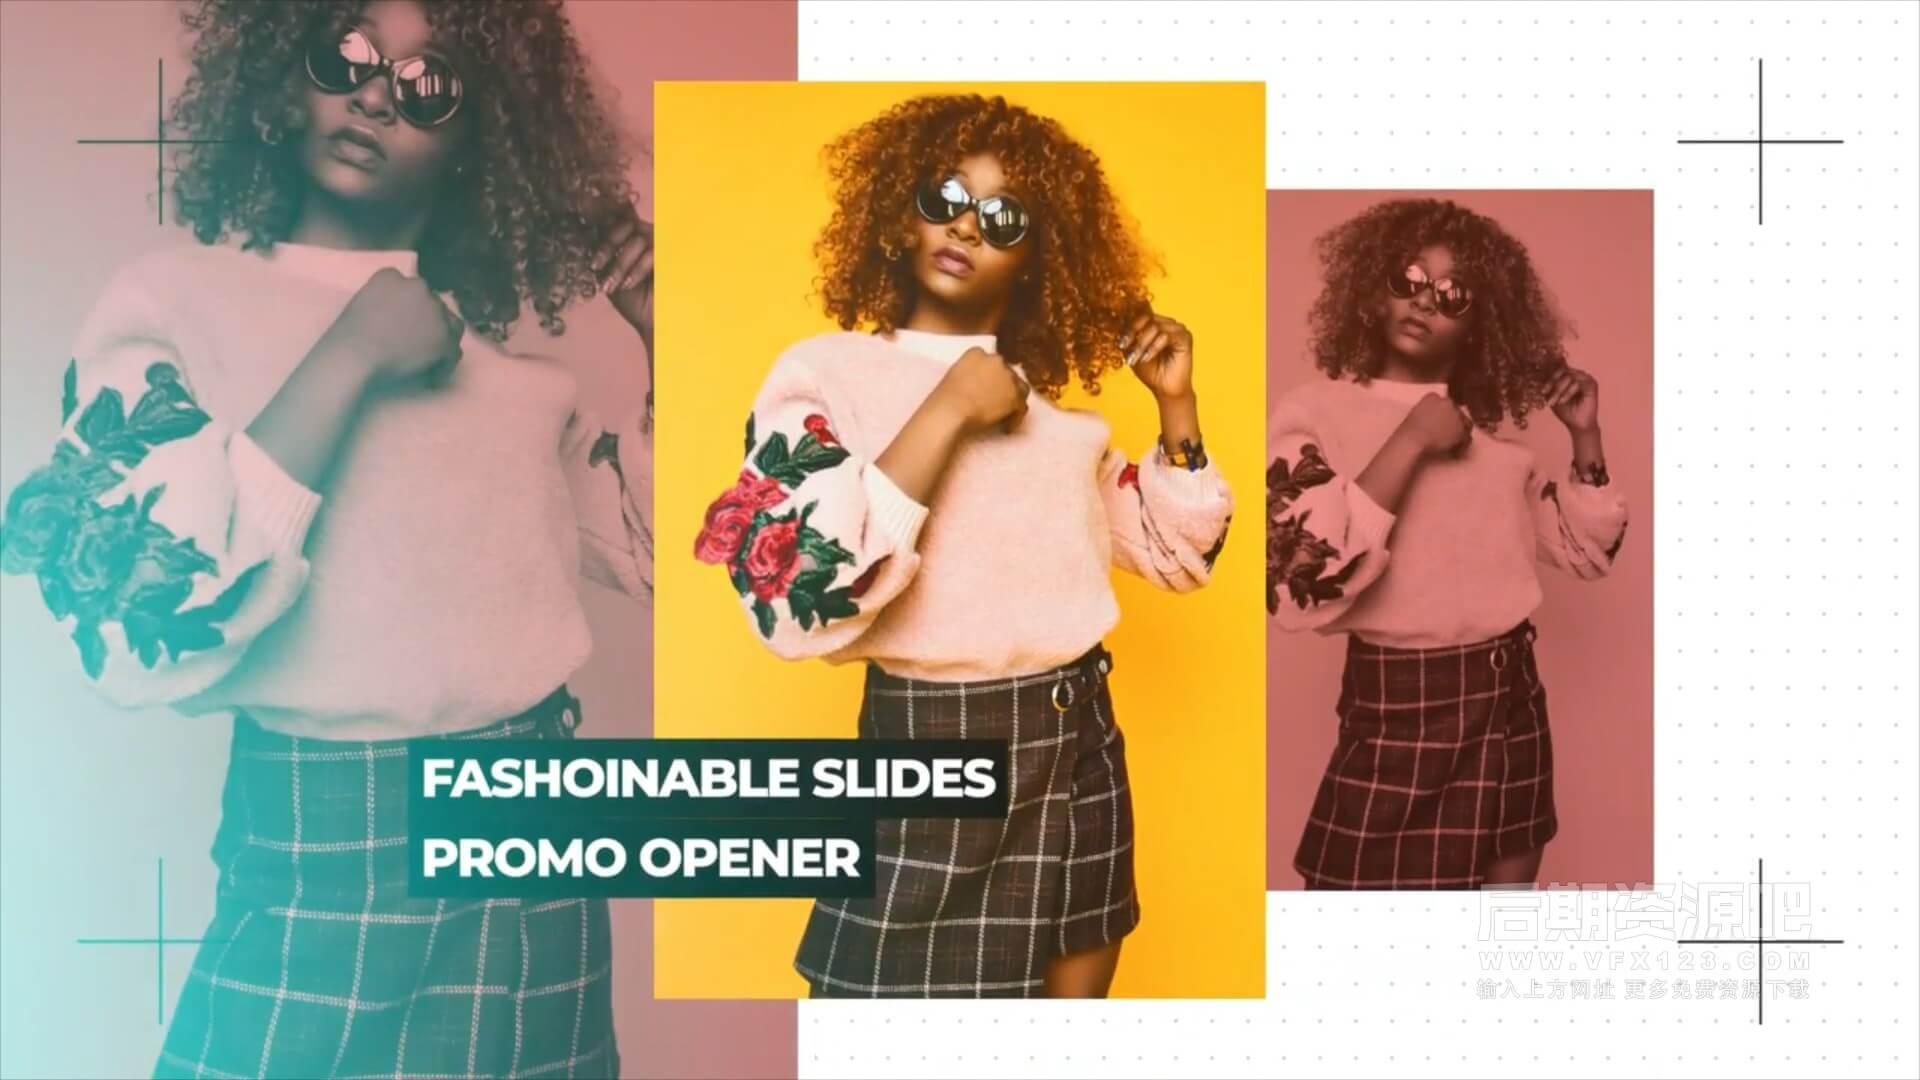 fcpx主题模板 流行时尚写真个人展示开场片头 Clean Fashion Opener